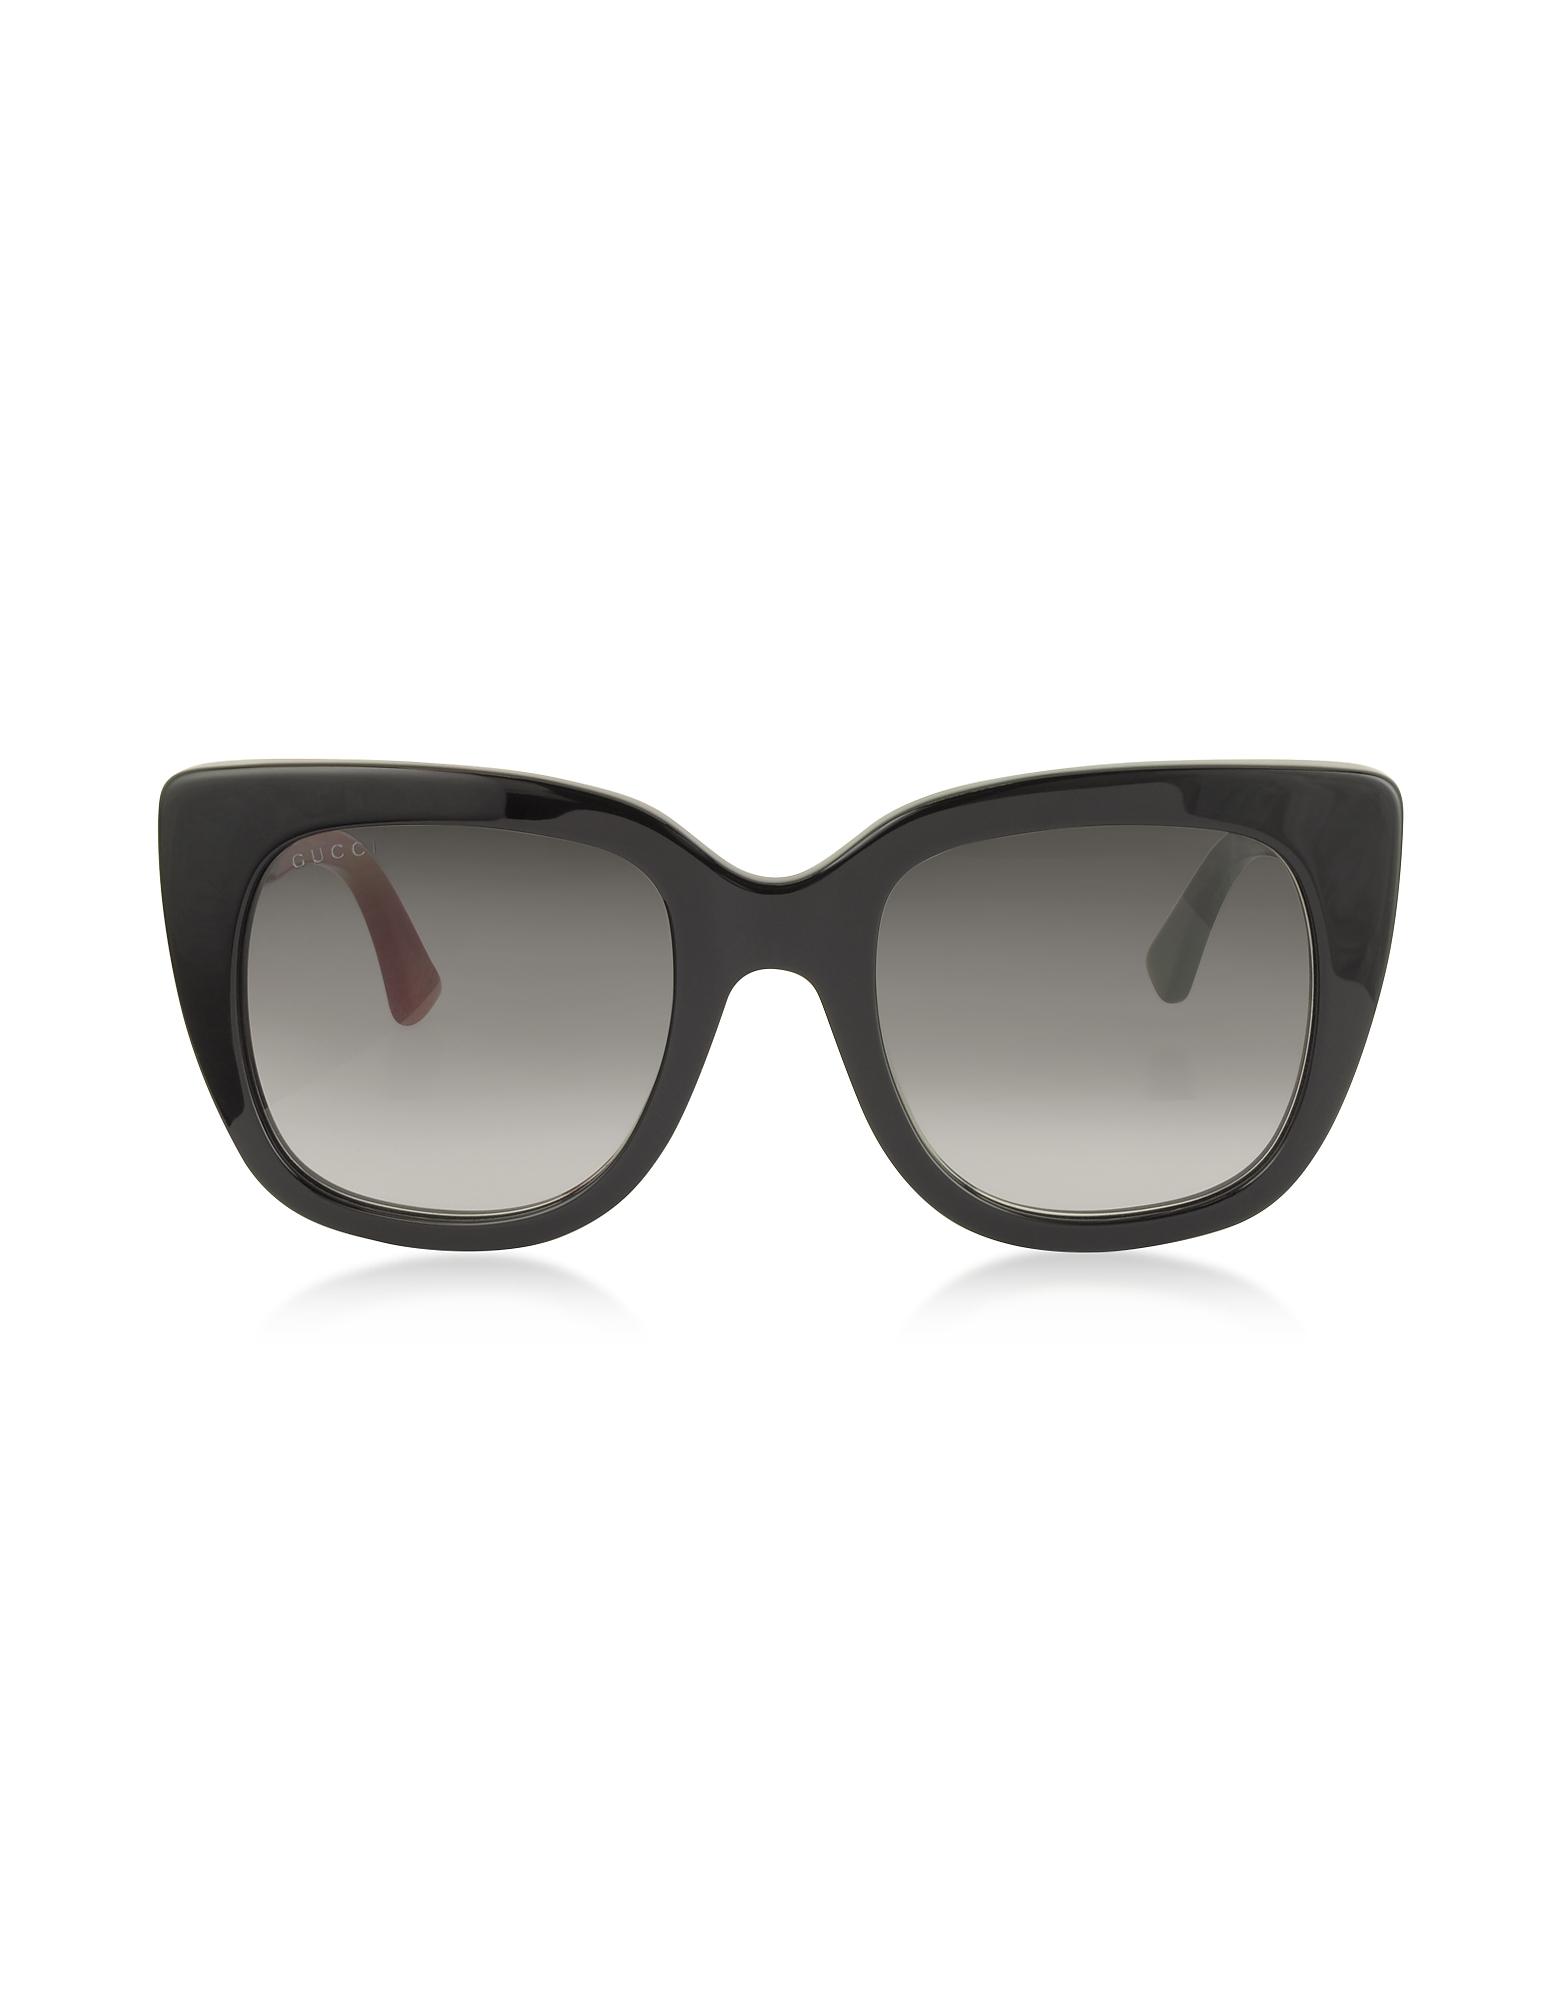 Gucci Designer Sunglasses, Squared-frame Optyl Sunglasses w/Web Temples